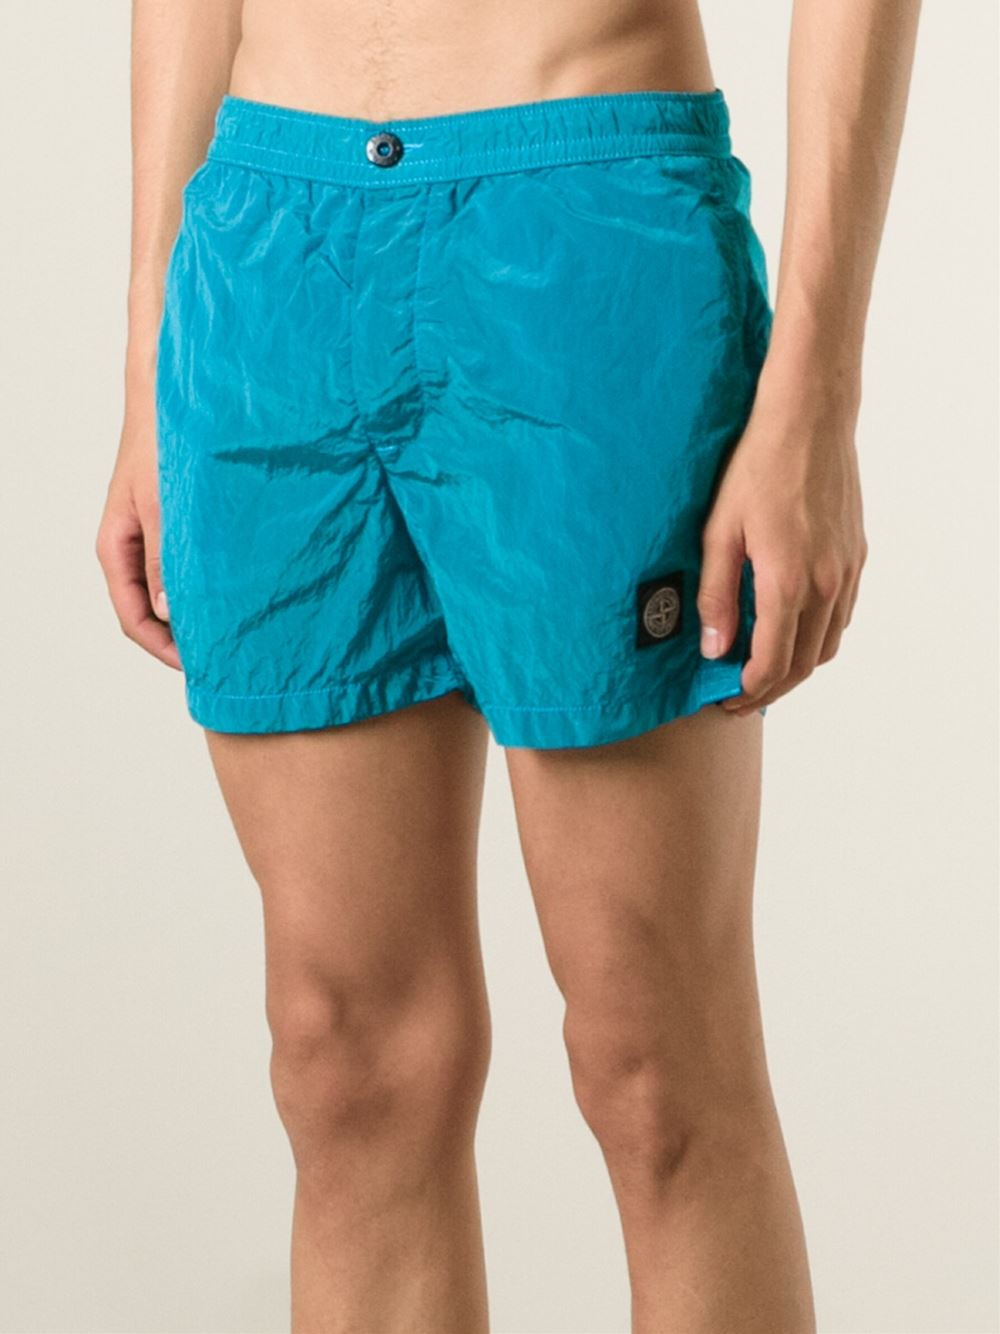 stone island logo swim shorts in blue for men lyst. Black Bedroom Furniture Sets. Home Design Ideas